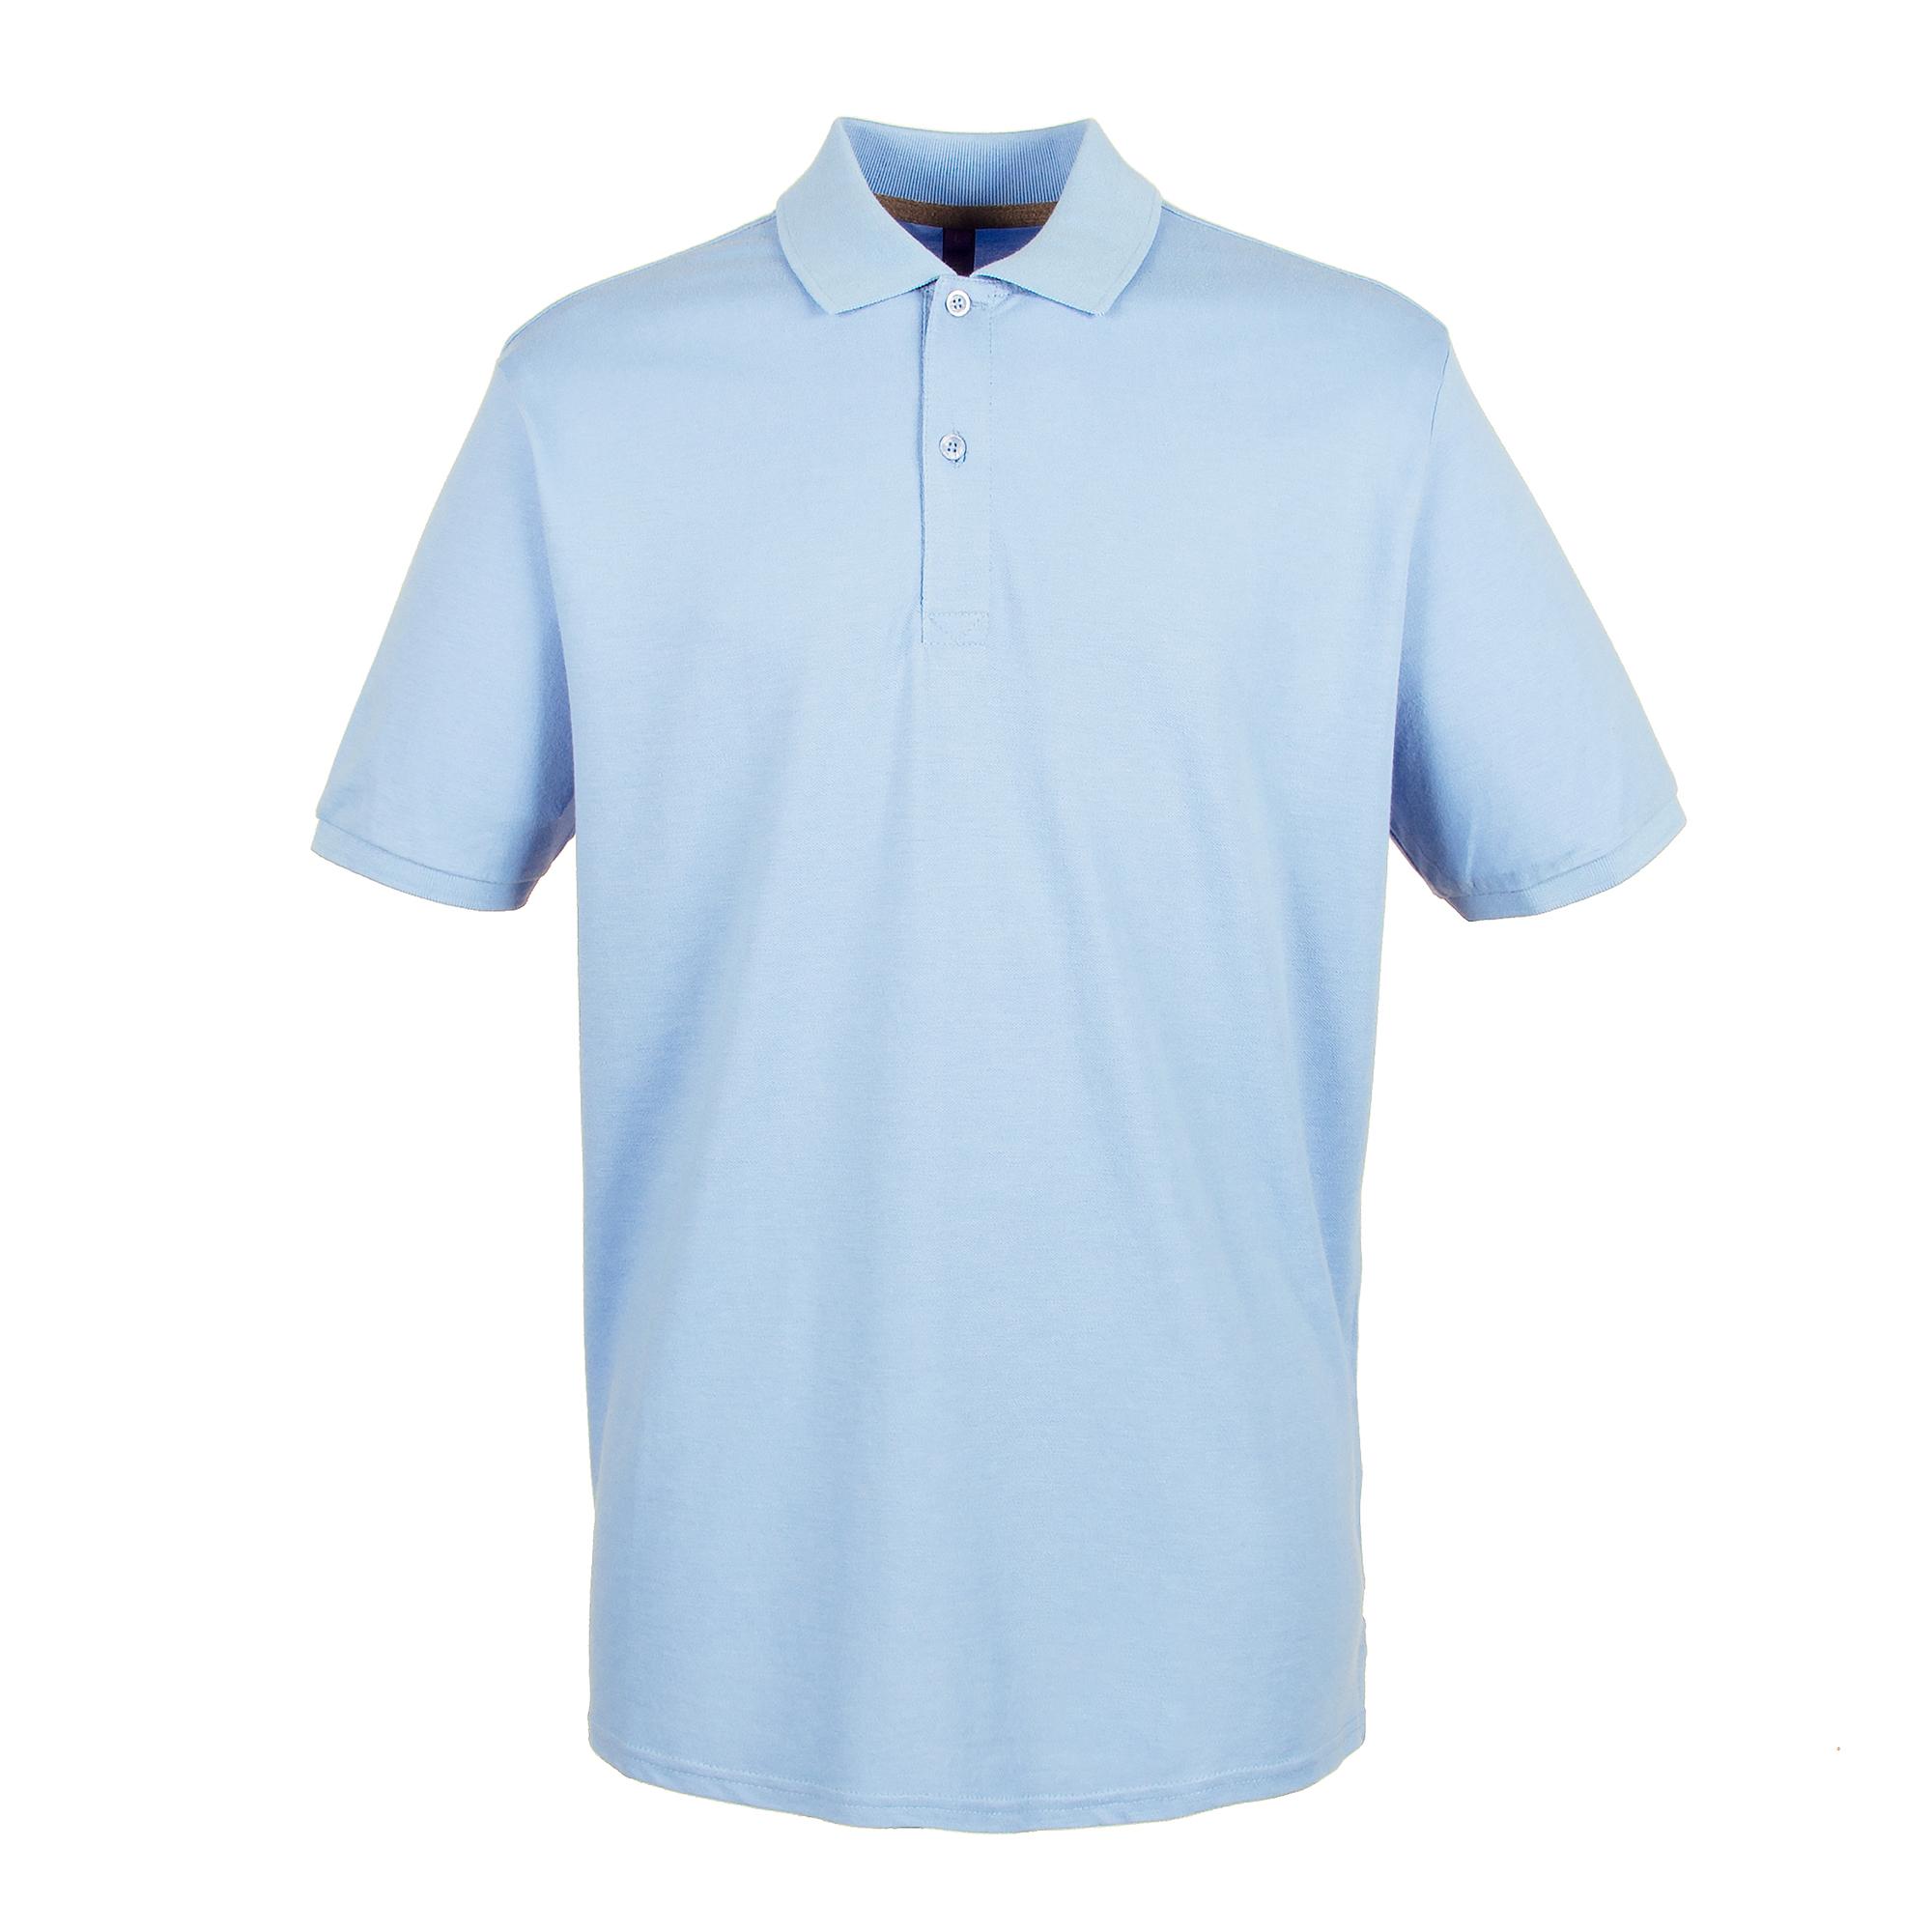 Henbury Mens Modern Fit Cotton Pique Polo Shirt (S) (Royal)